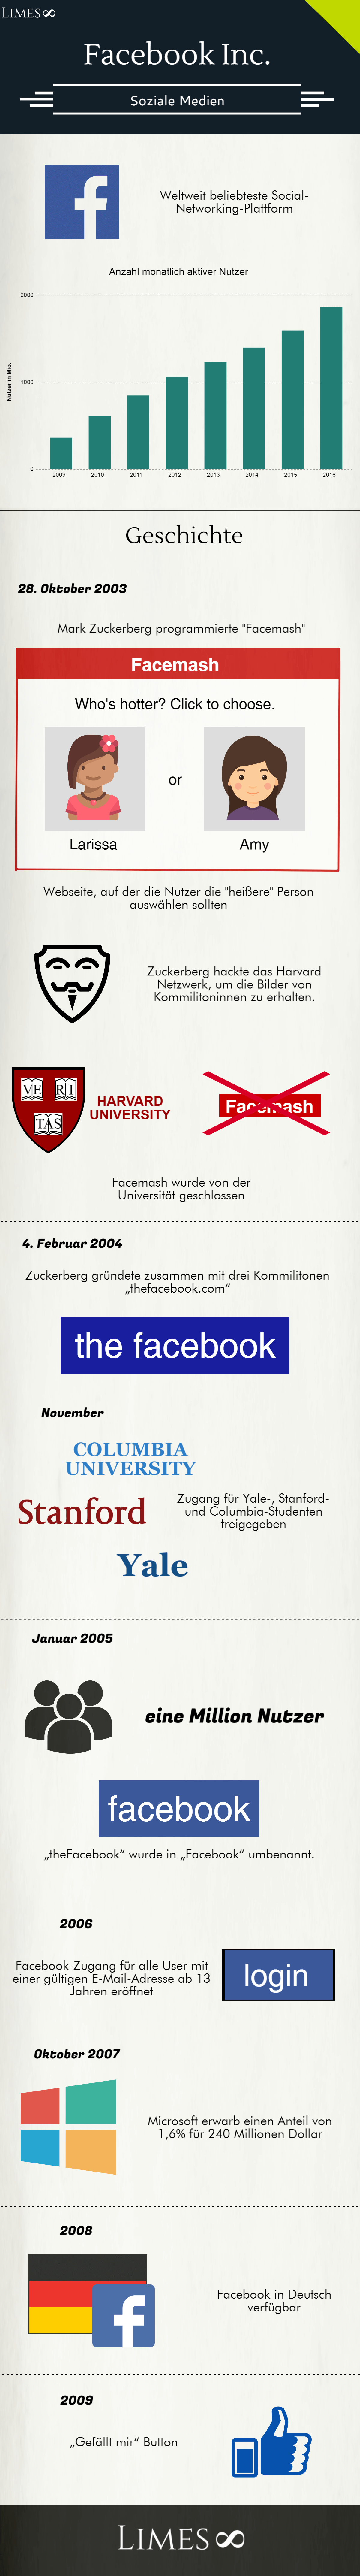 Infografik über die Facebook Inc.